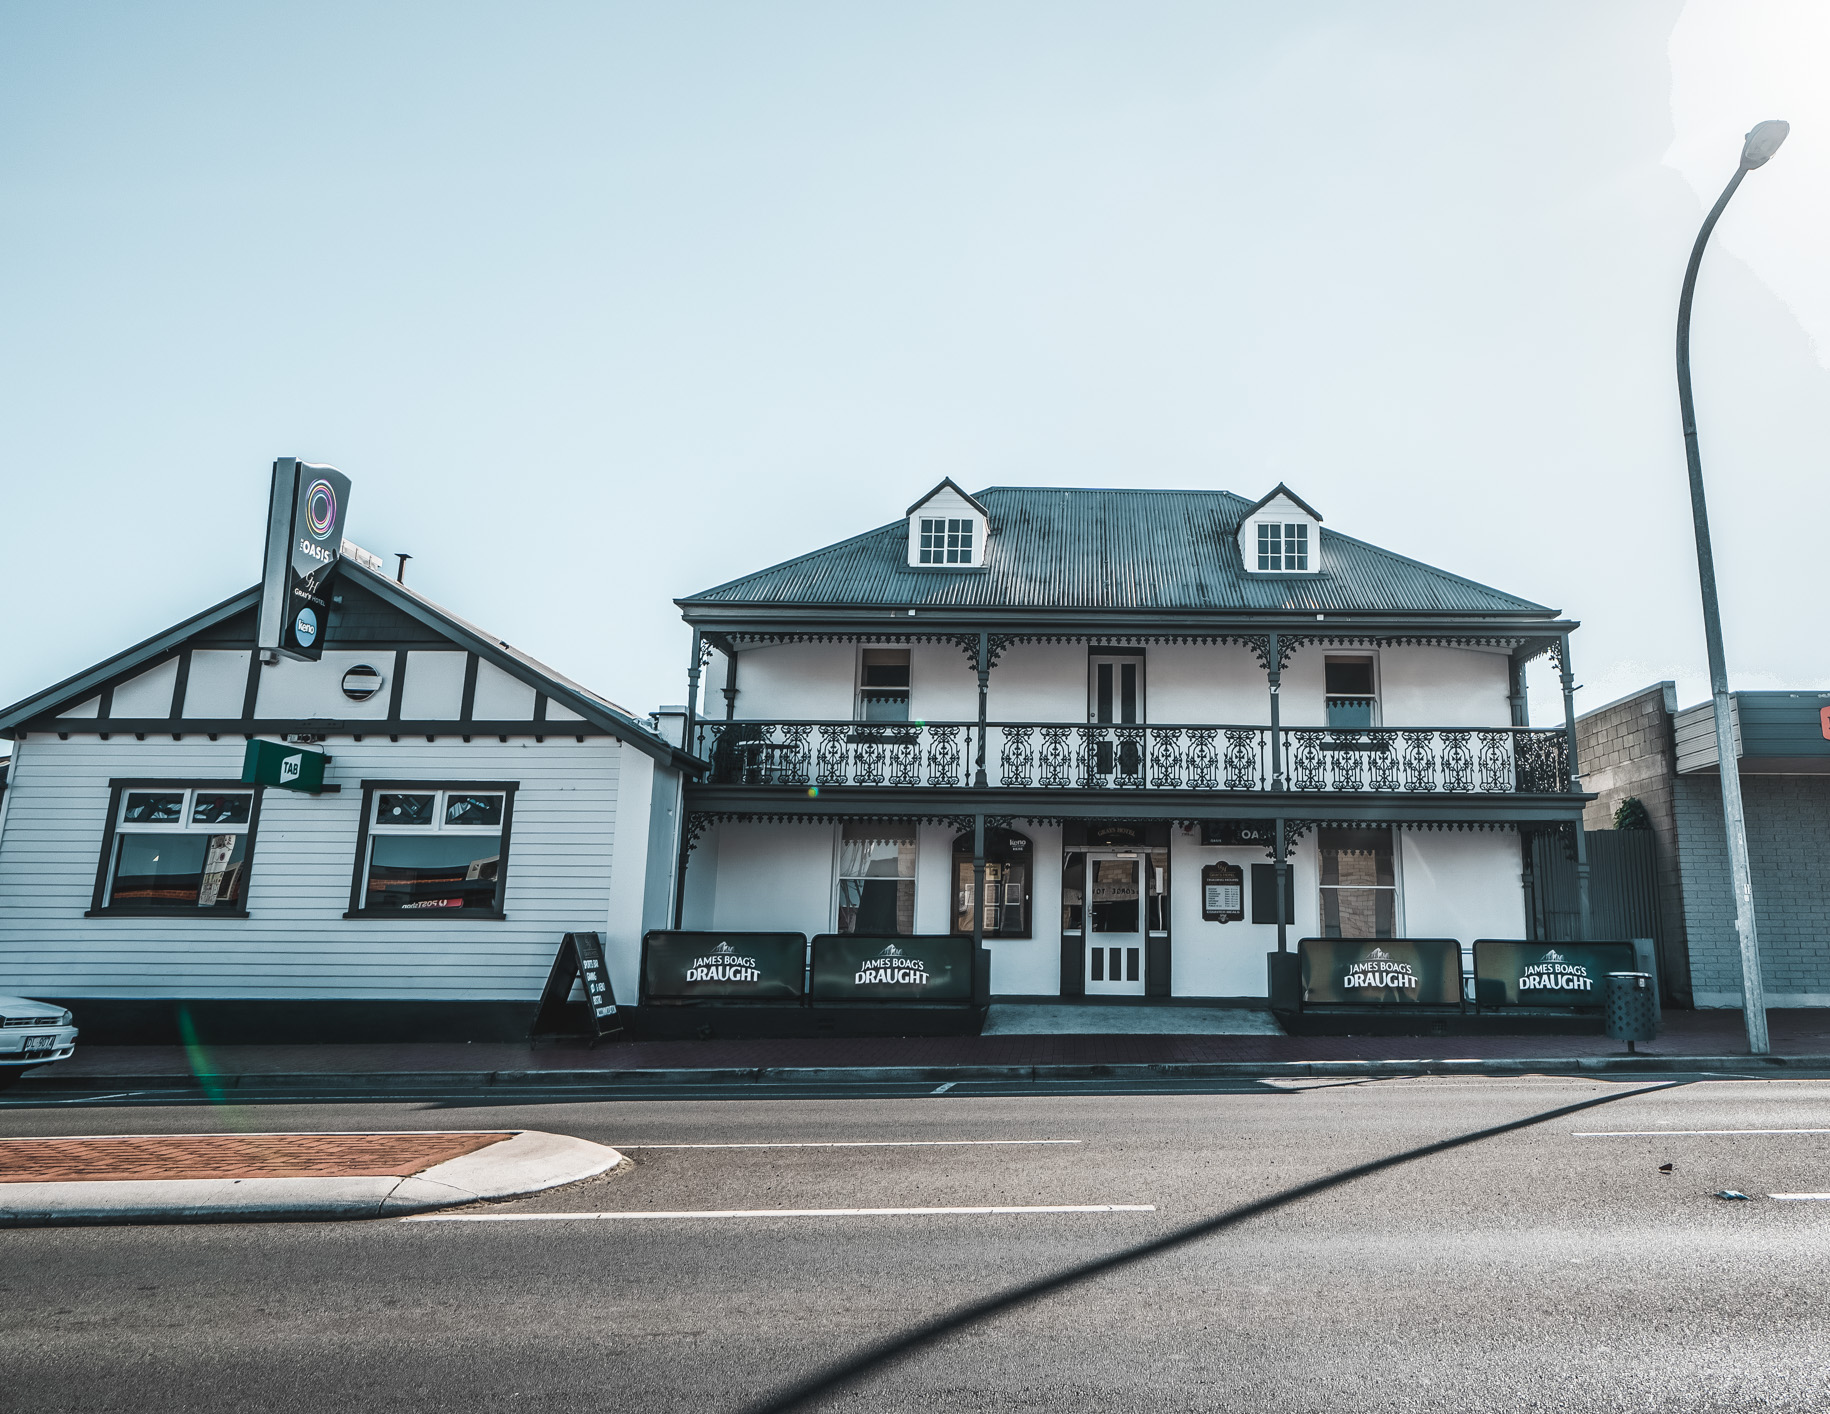 Gray's Hotel (Web) (13 of 16).jpg